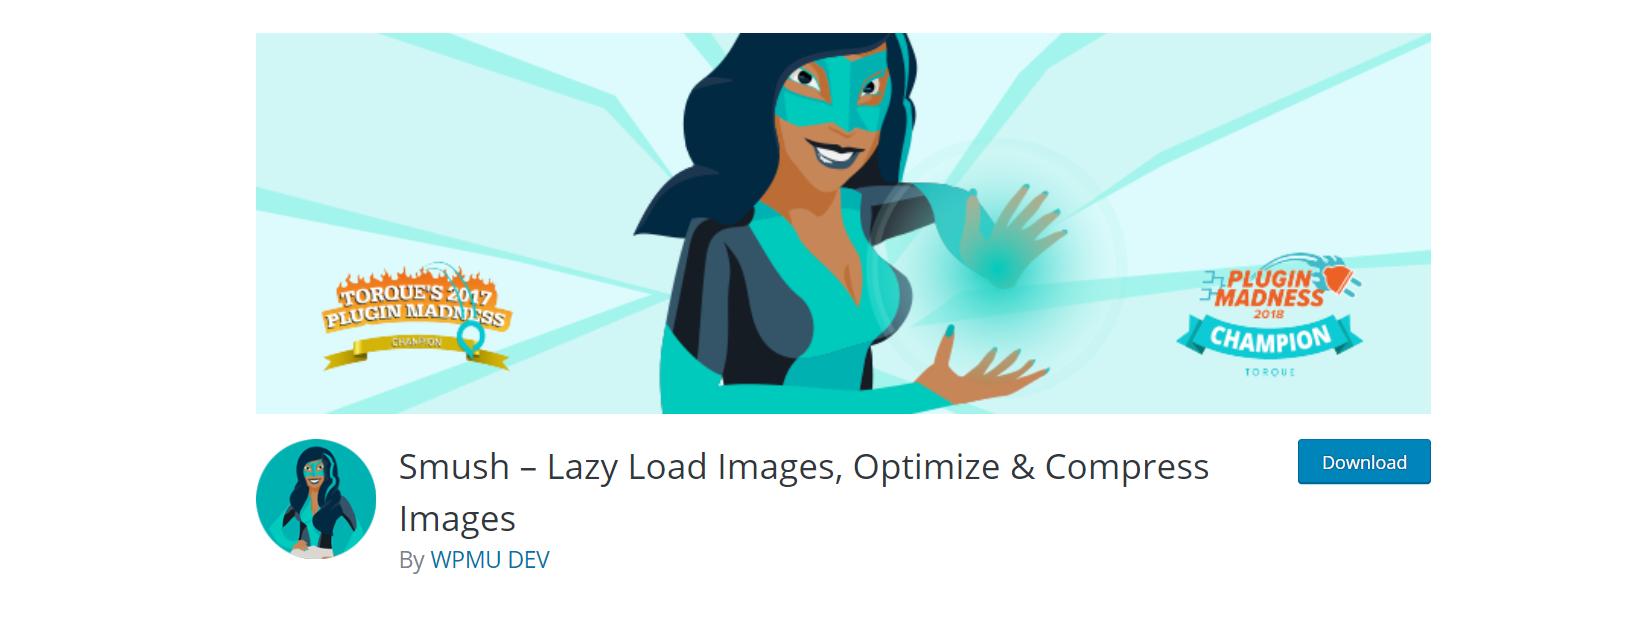 Image compressor WordPress plugins for blogs